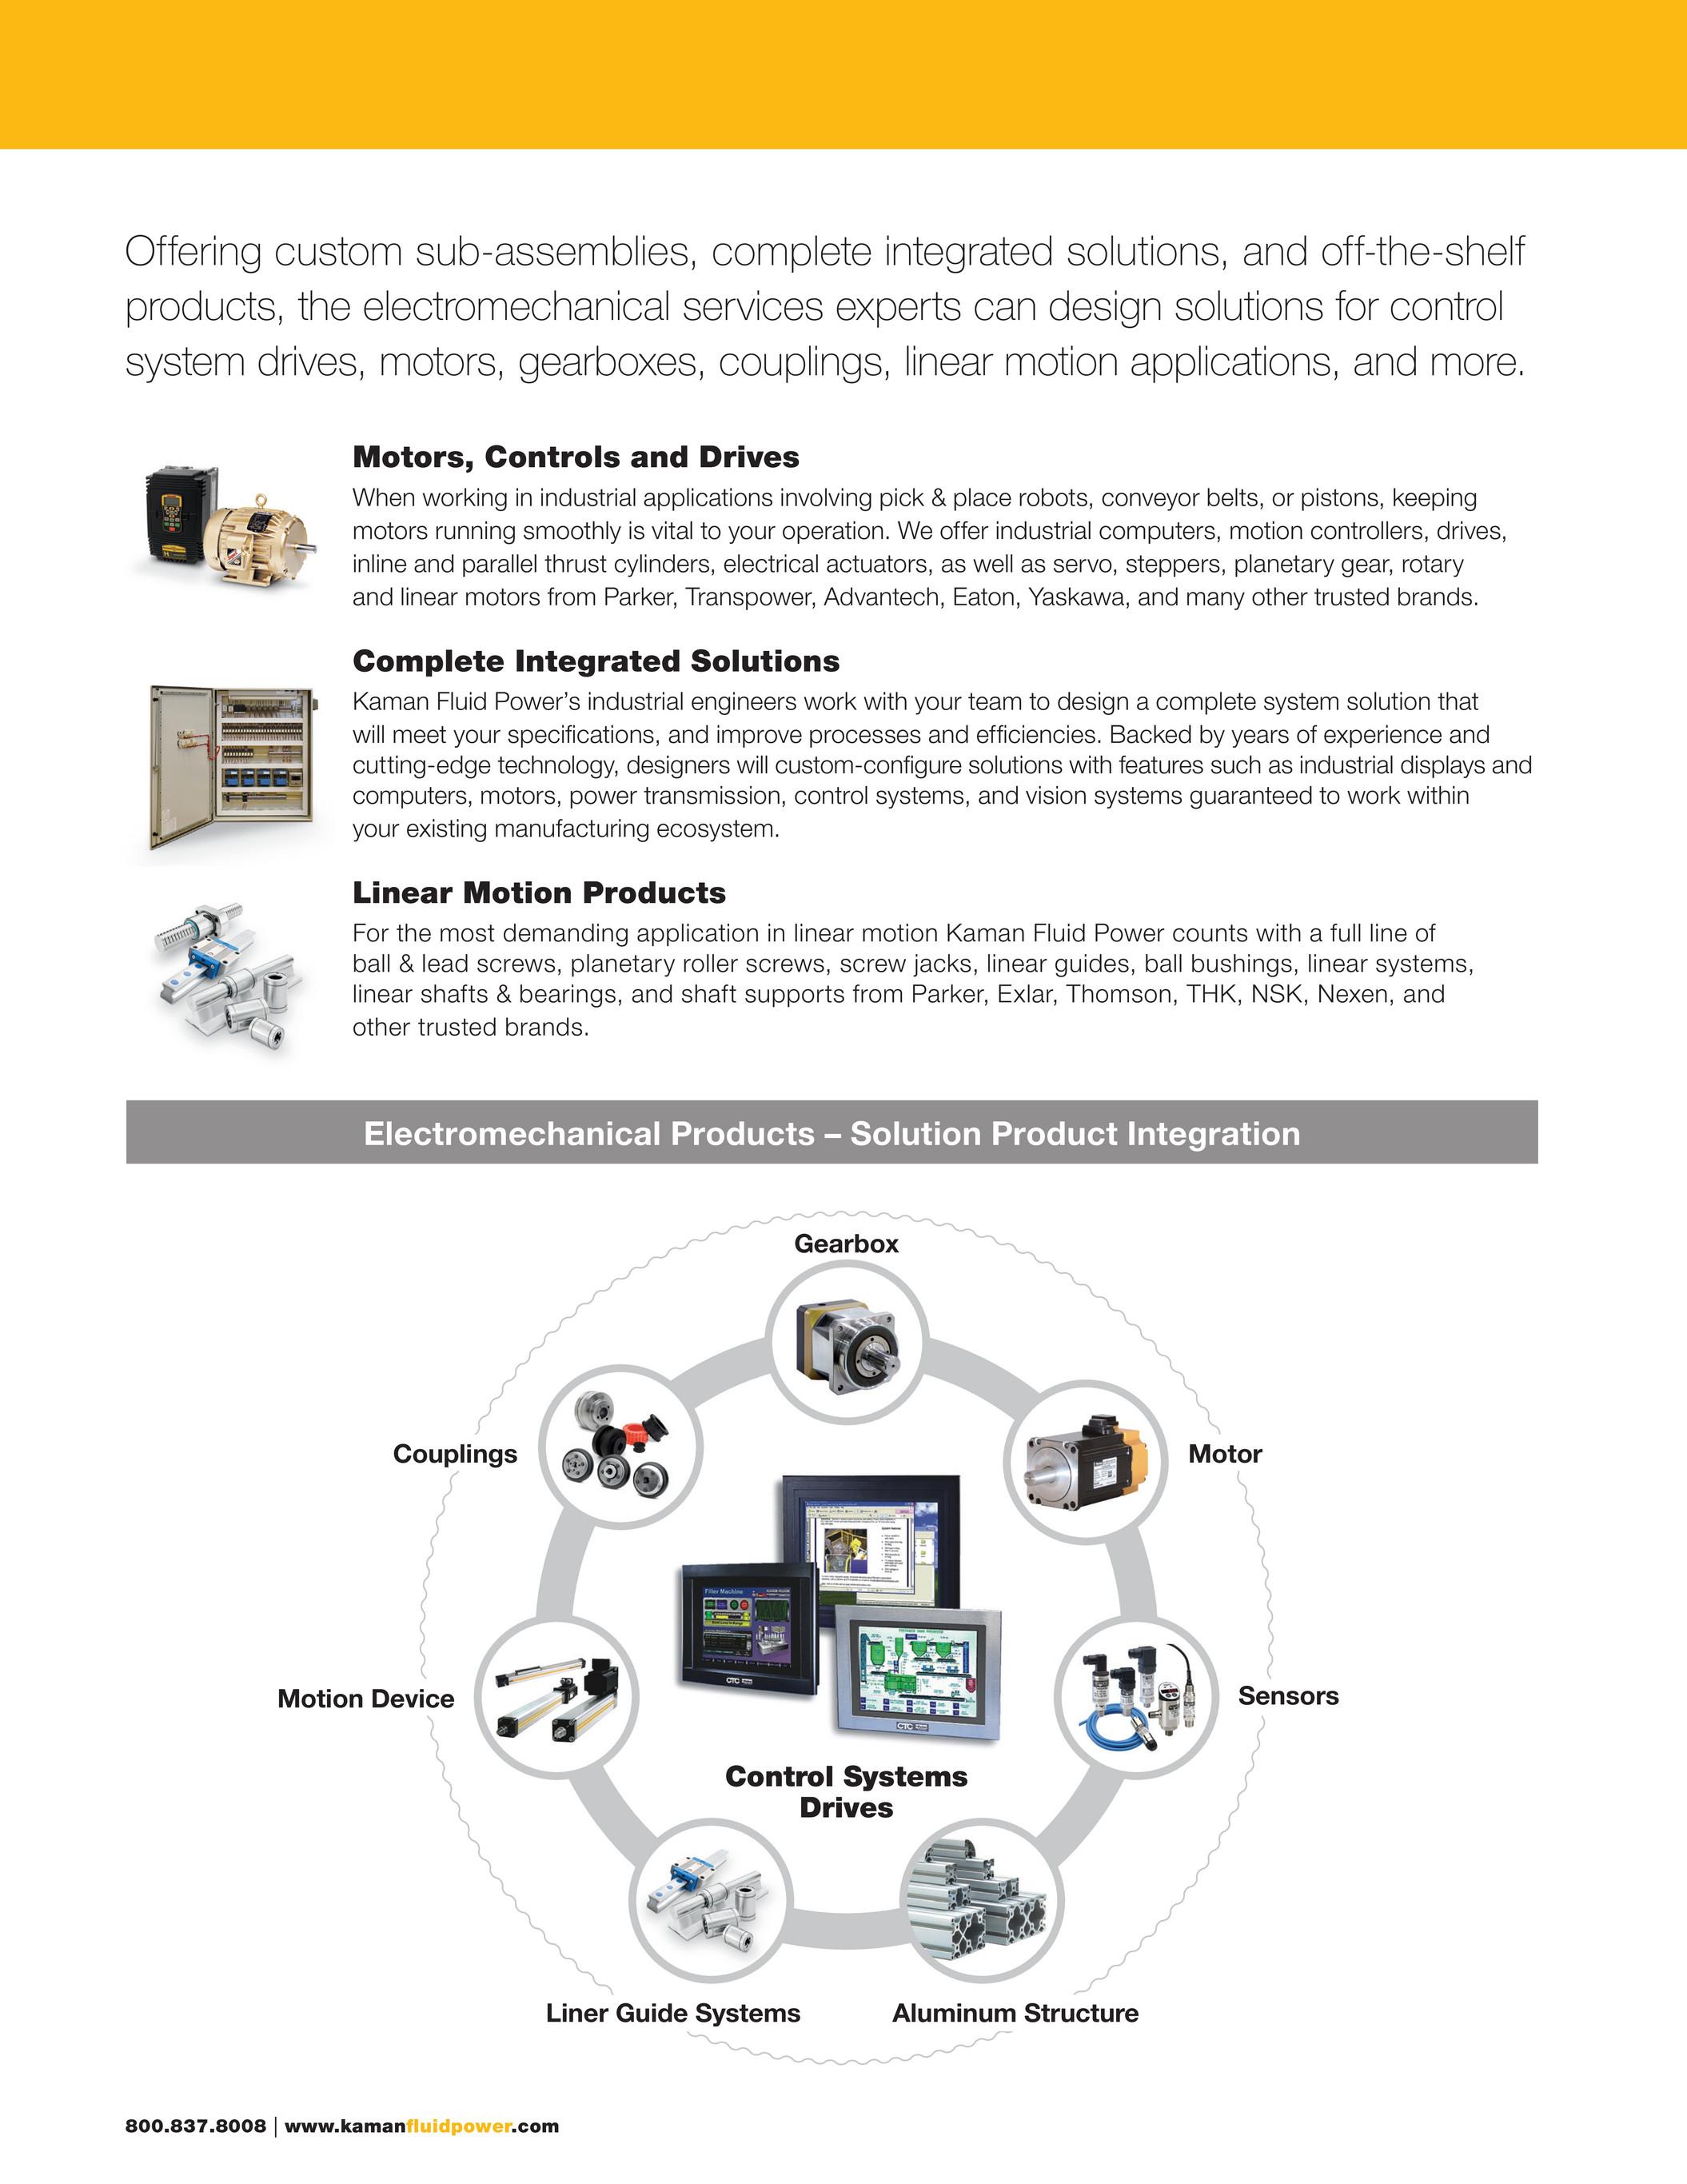 Kaman Distribution Kaman Fluid Power Electromechanical Capabilities Page 4